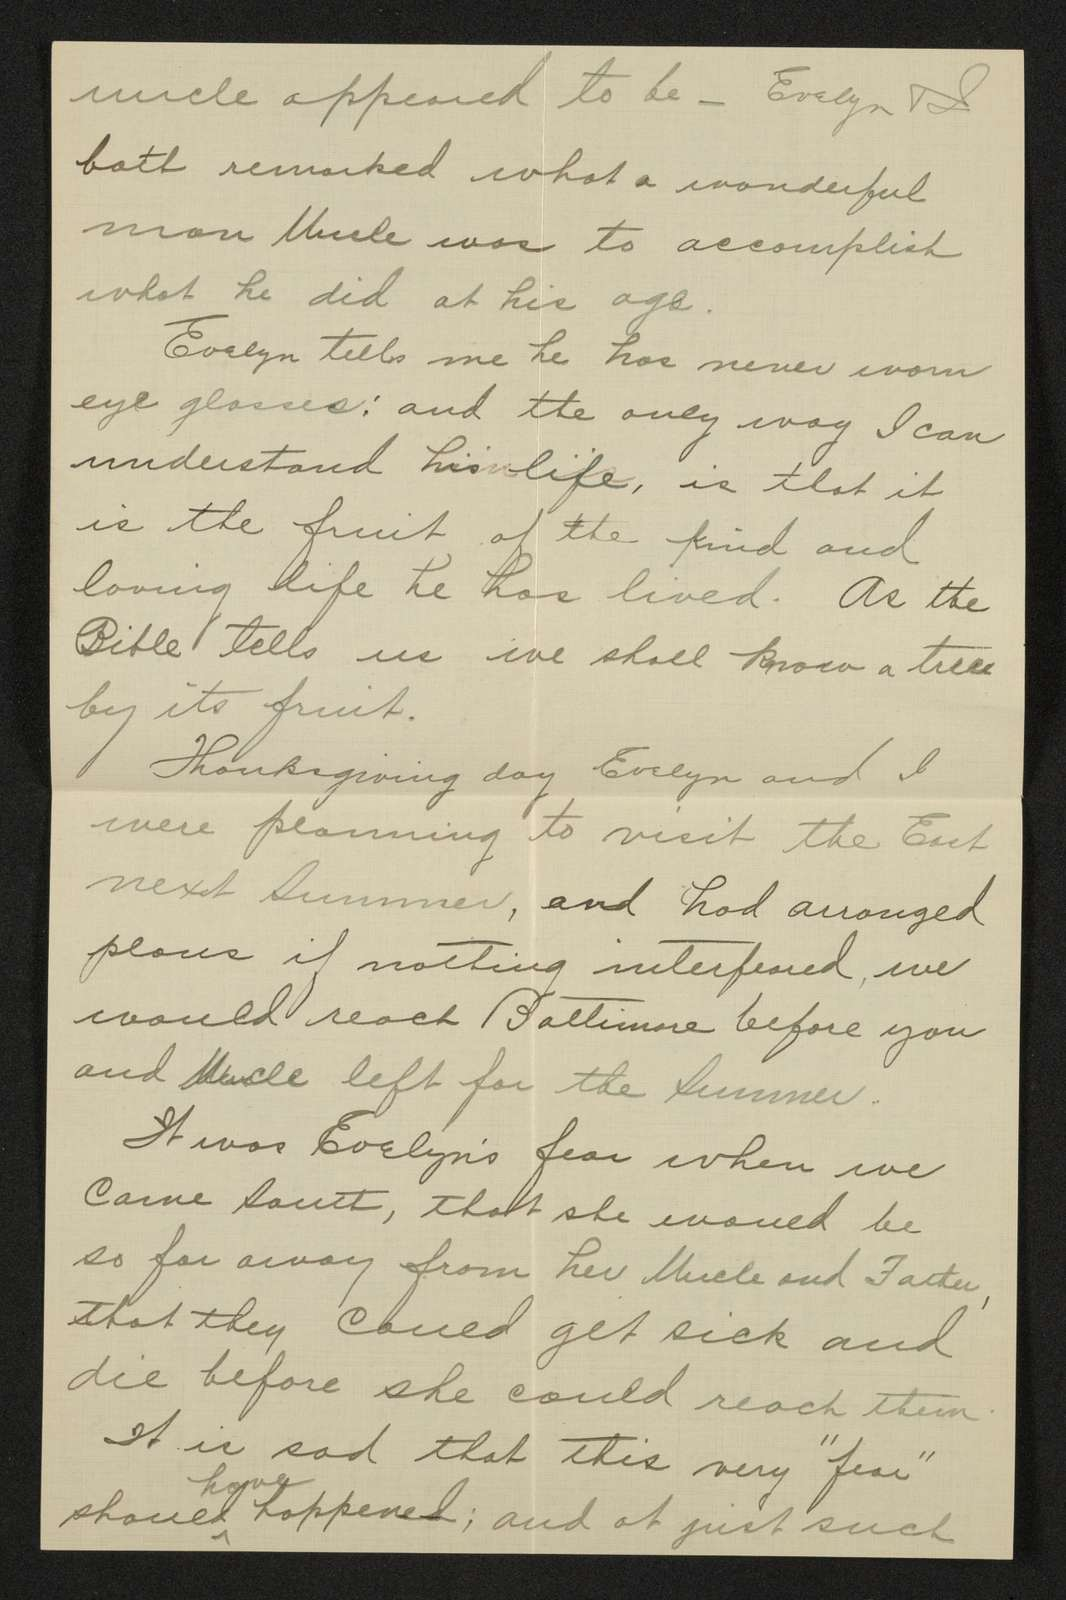 Lewis H. Machen Family Papers: Gresham Family Correspondence, 1834-1925; 1901-1925